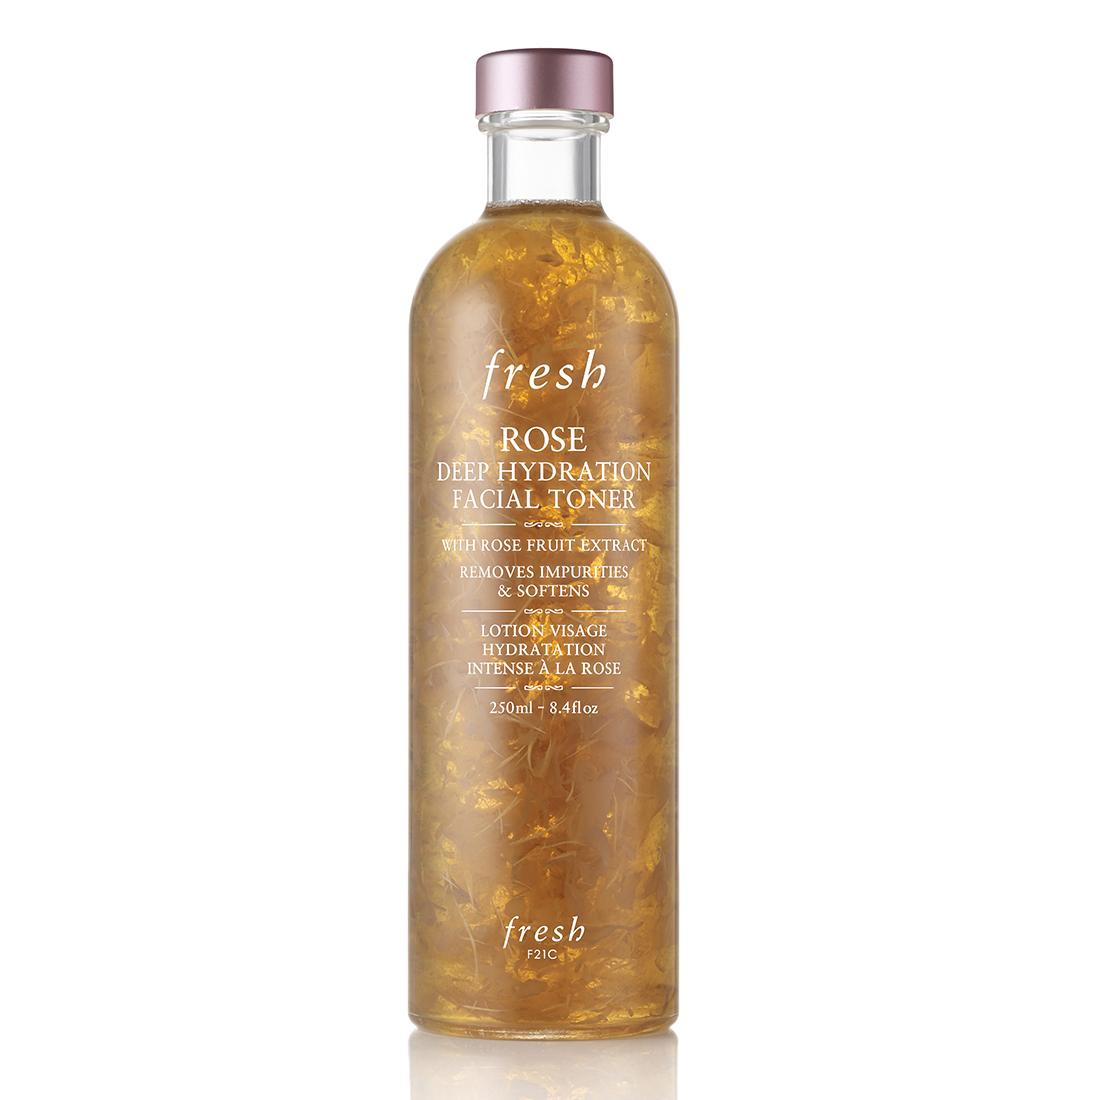 1-Fresh Rose Deep Hydration Facial Tonerjpg